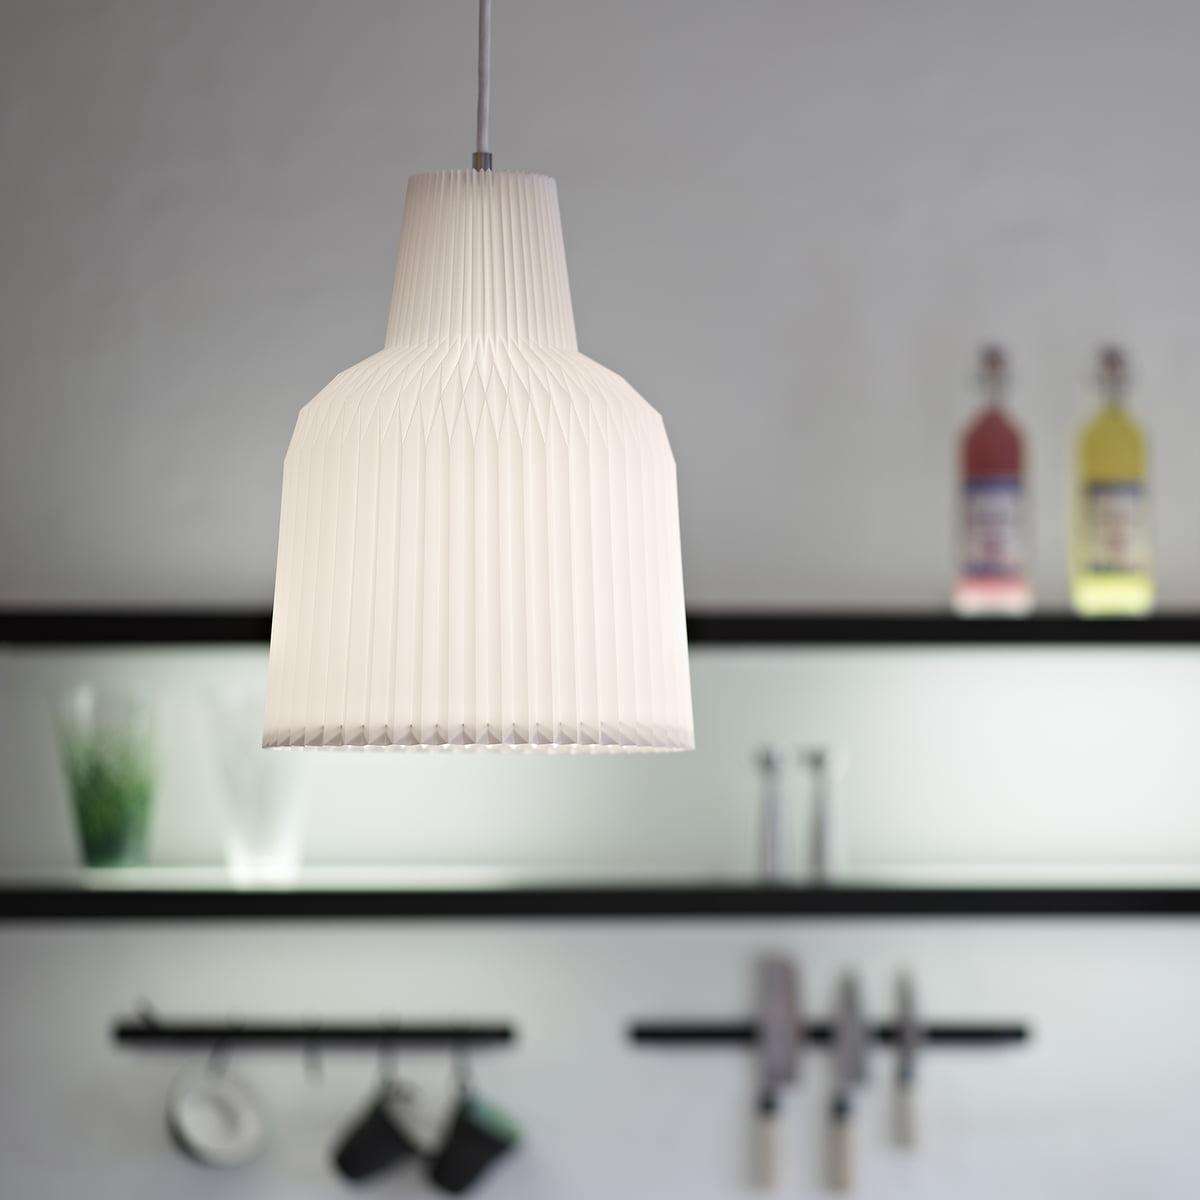 La Cloche Pendant Lamp from Le Klint